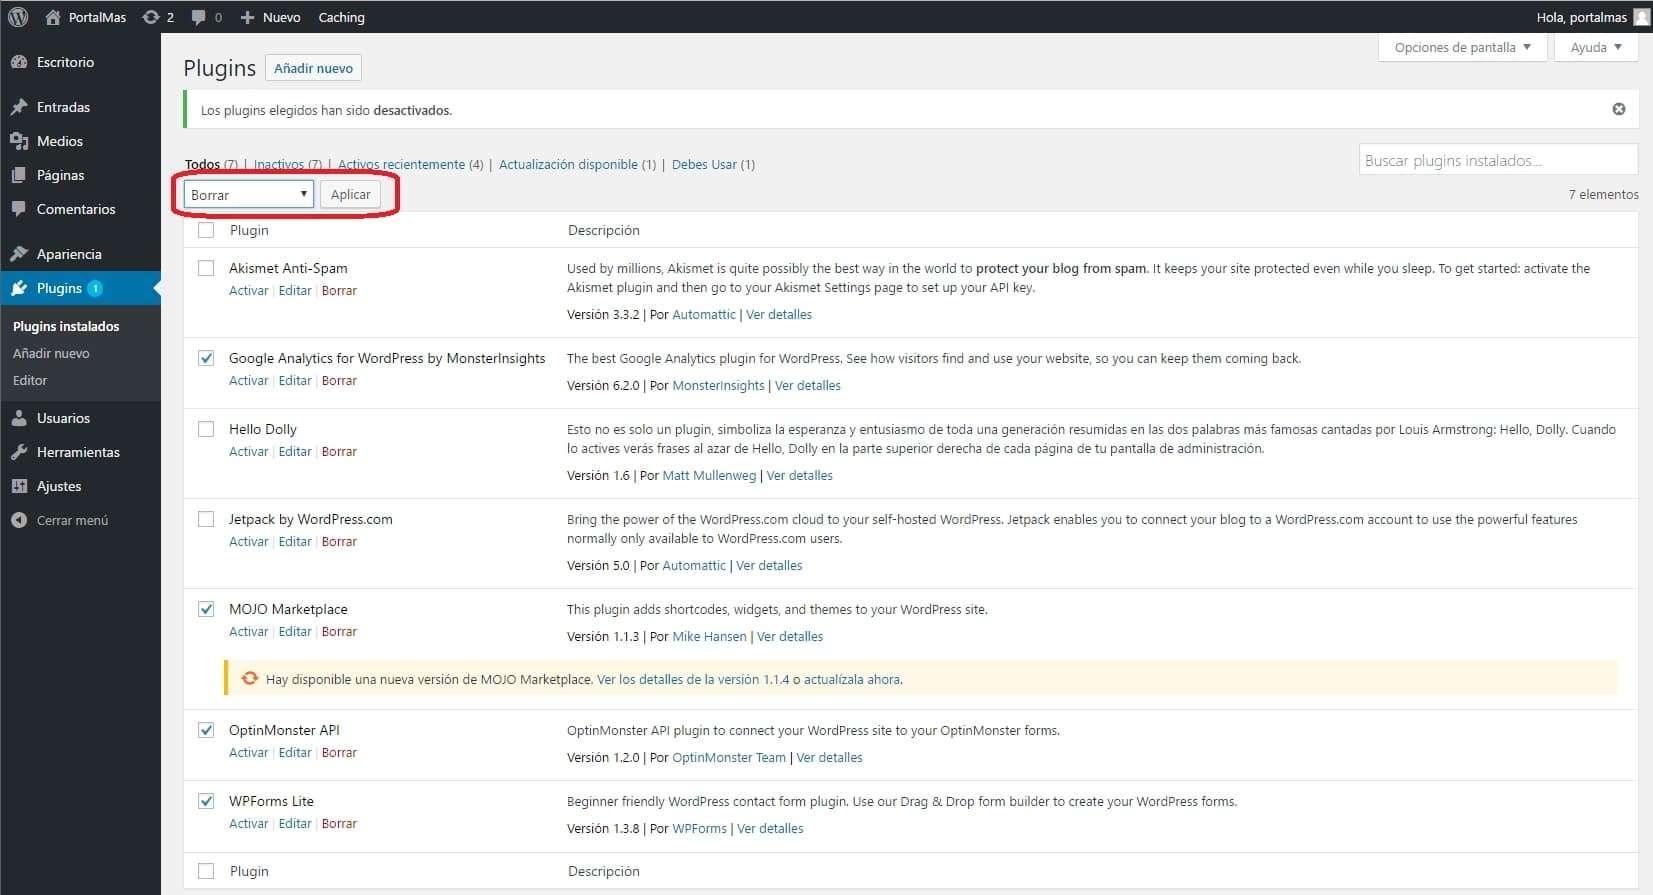 Instalar Wordpress en Hostgator Cloud Hosting paso a paso 13